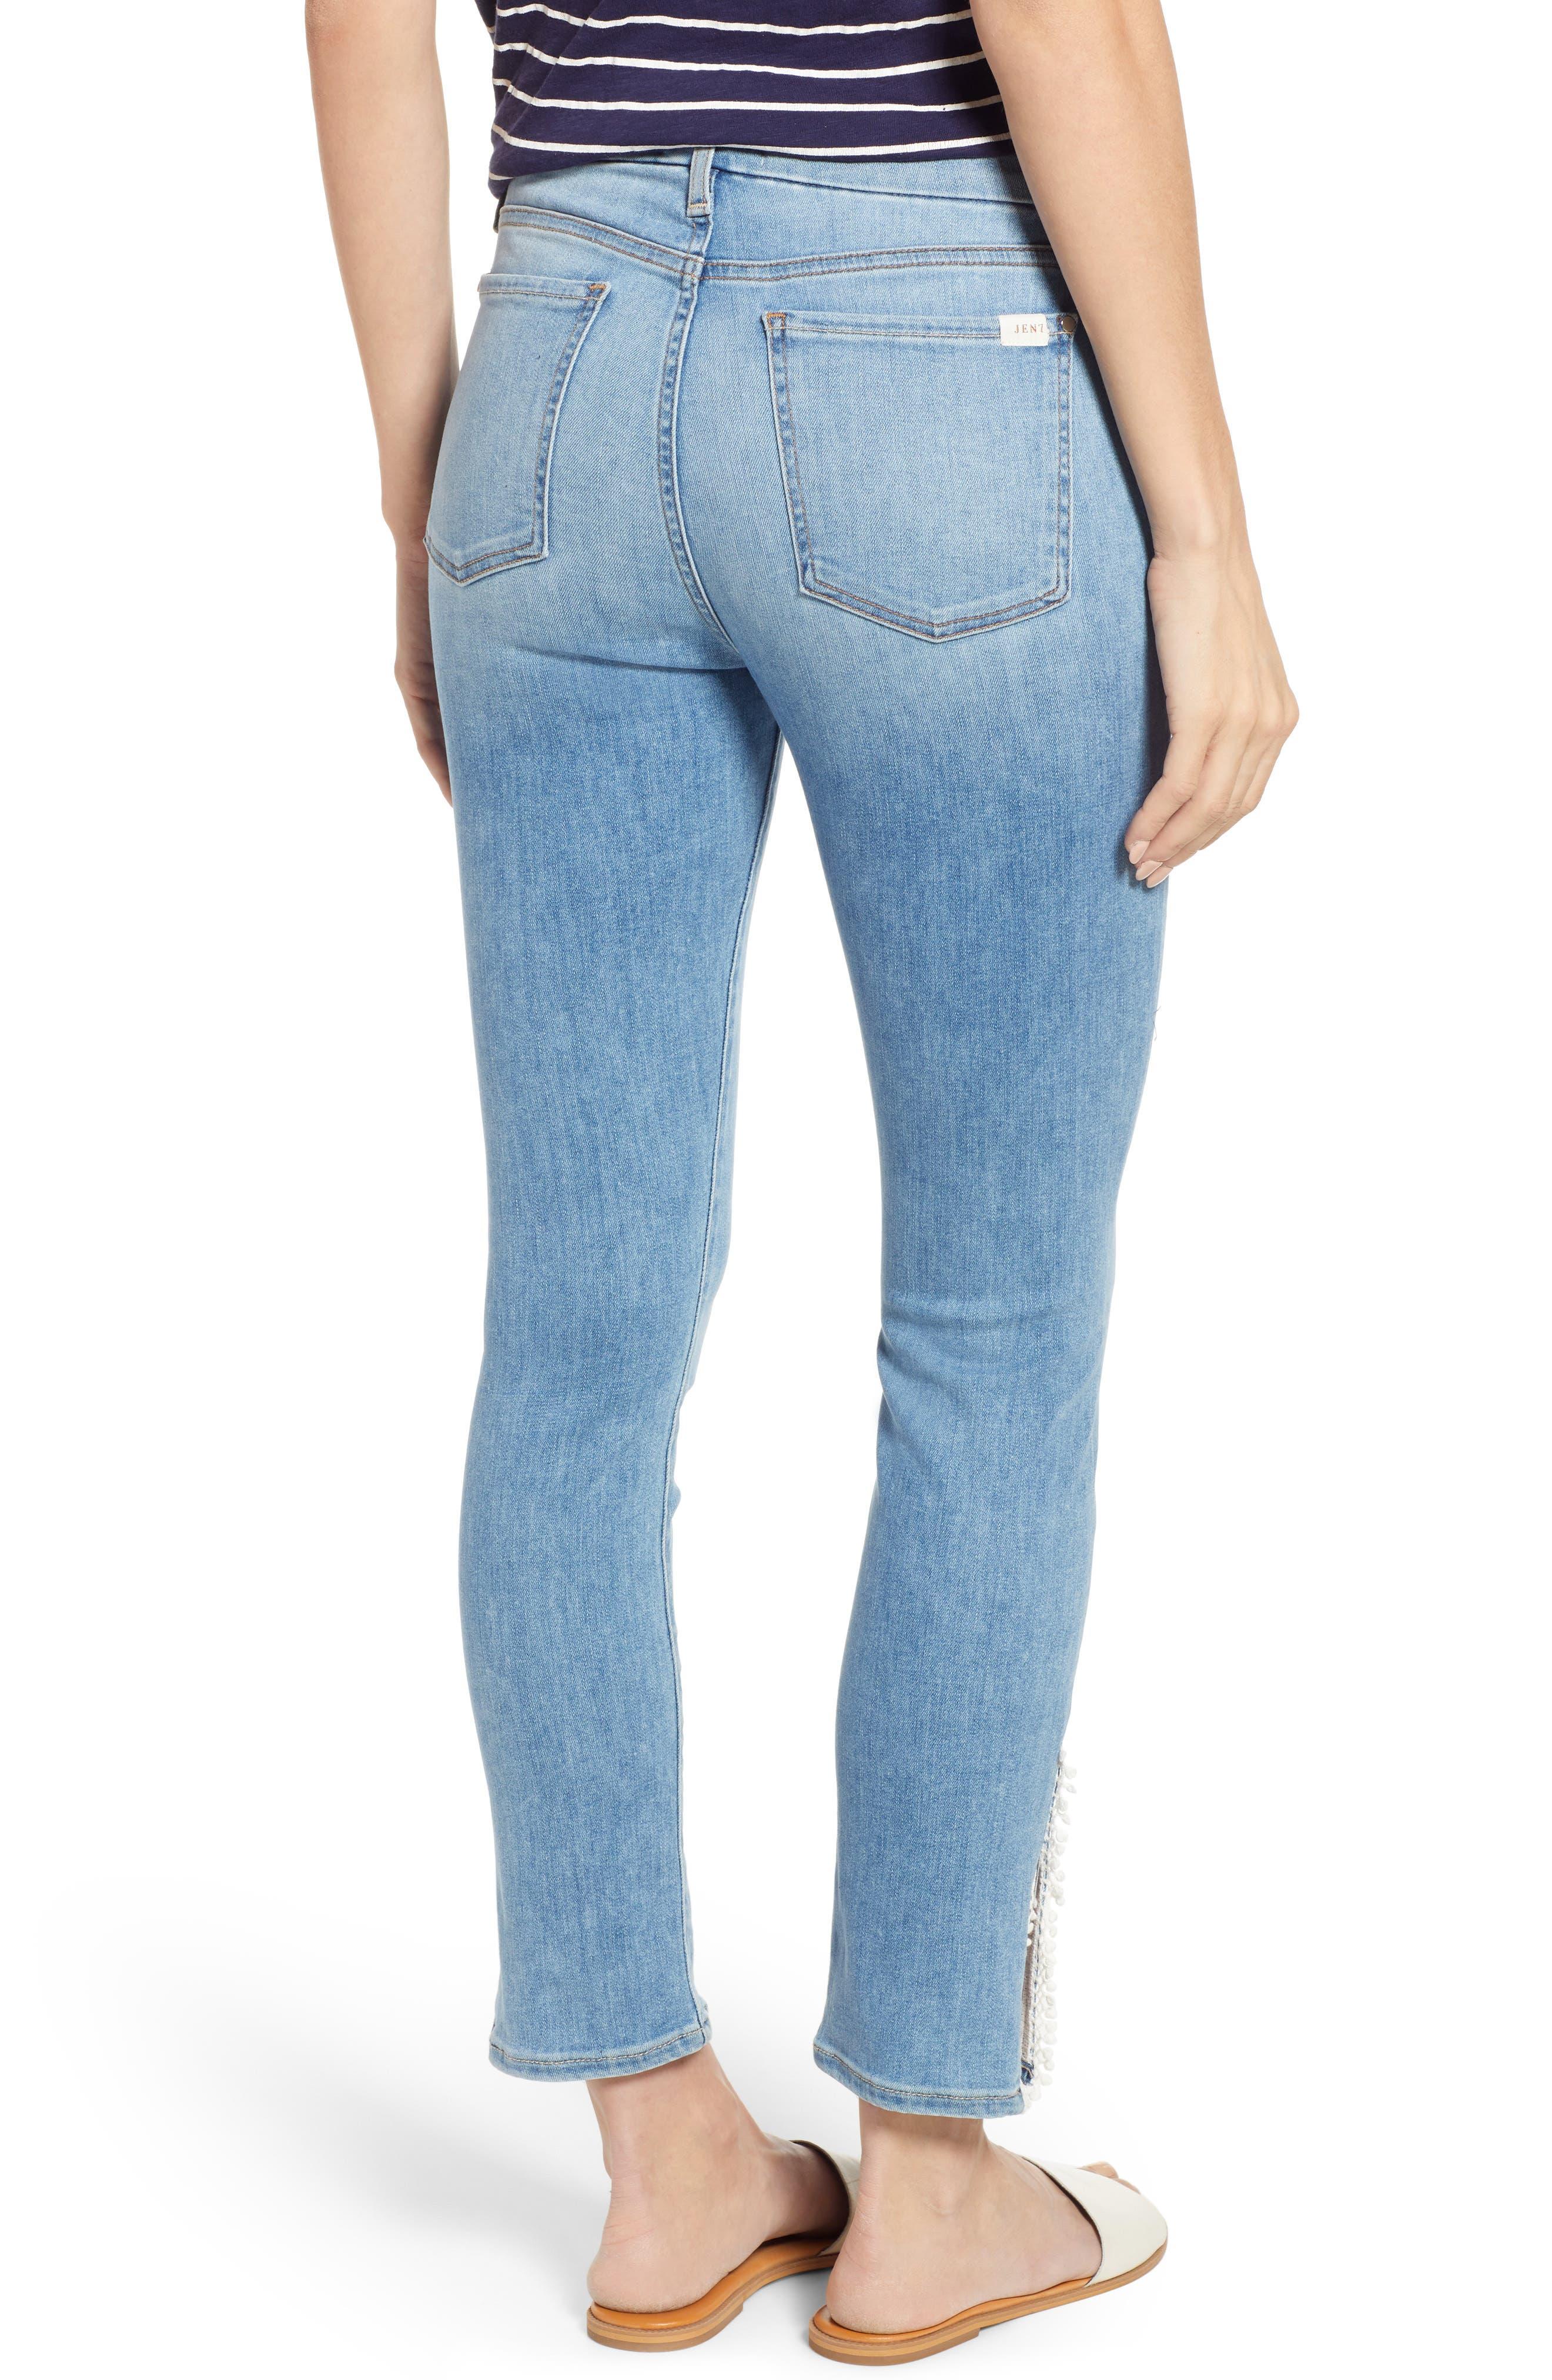 JEN7 BY 7 FOR ALL MANKIND, Pompom Detail Crop Skinny Jeans, Alternate thumbnail 2, color, LA QUINTA POM POM